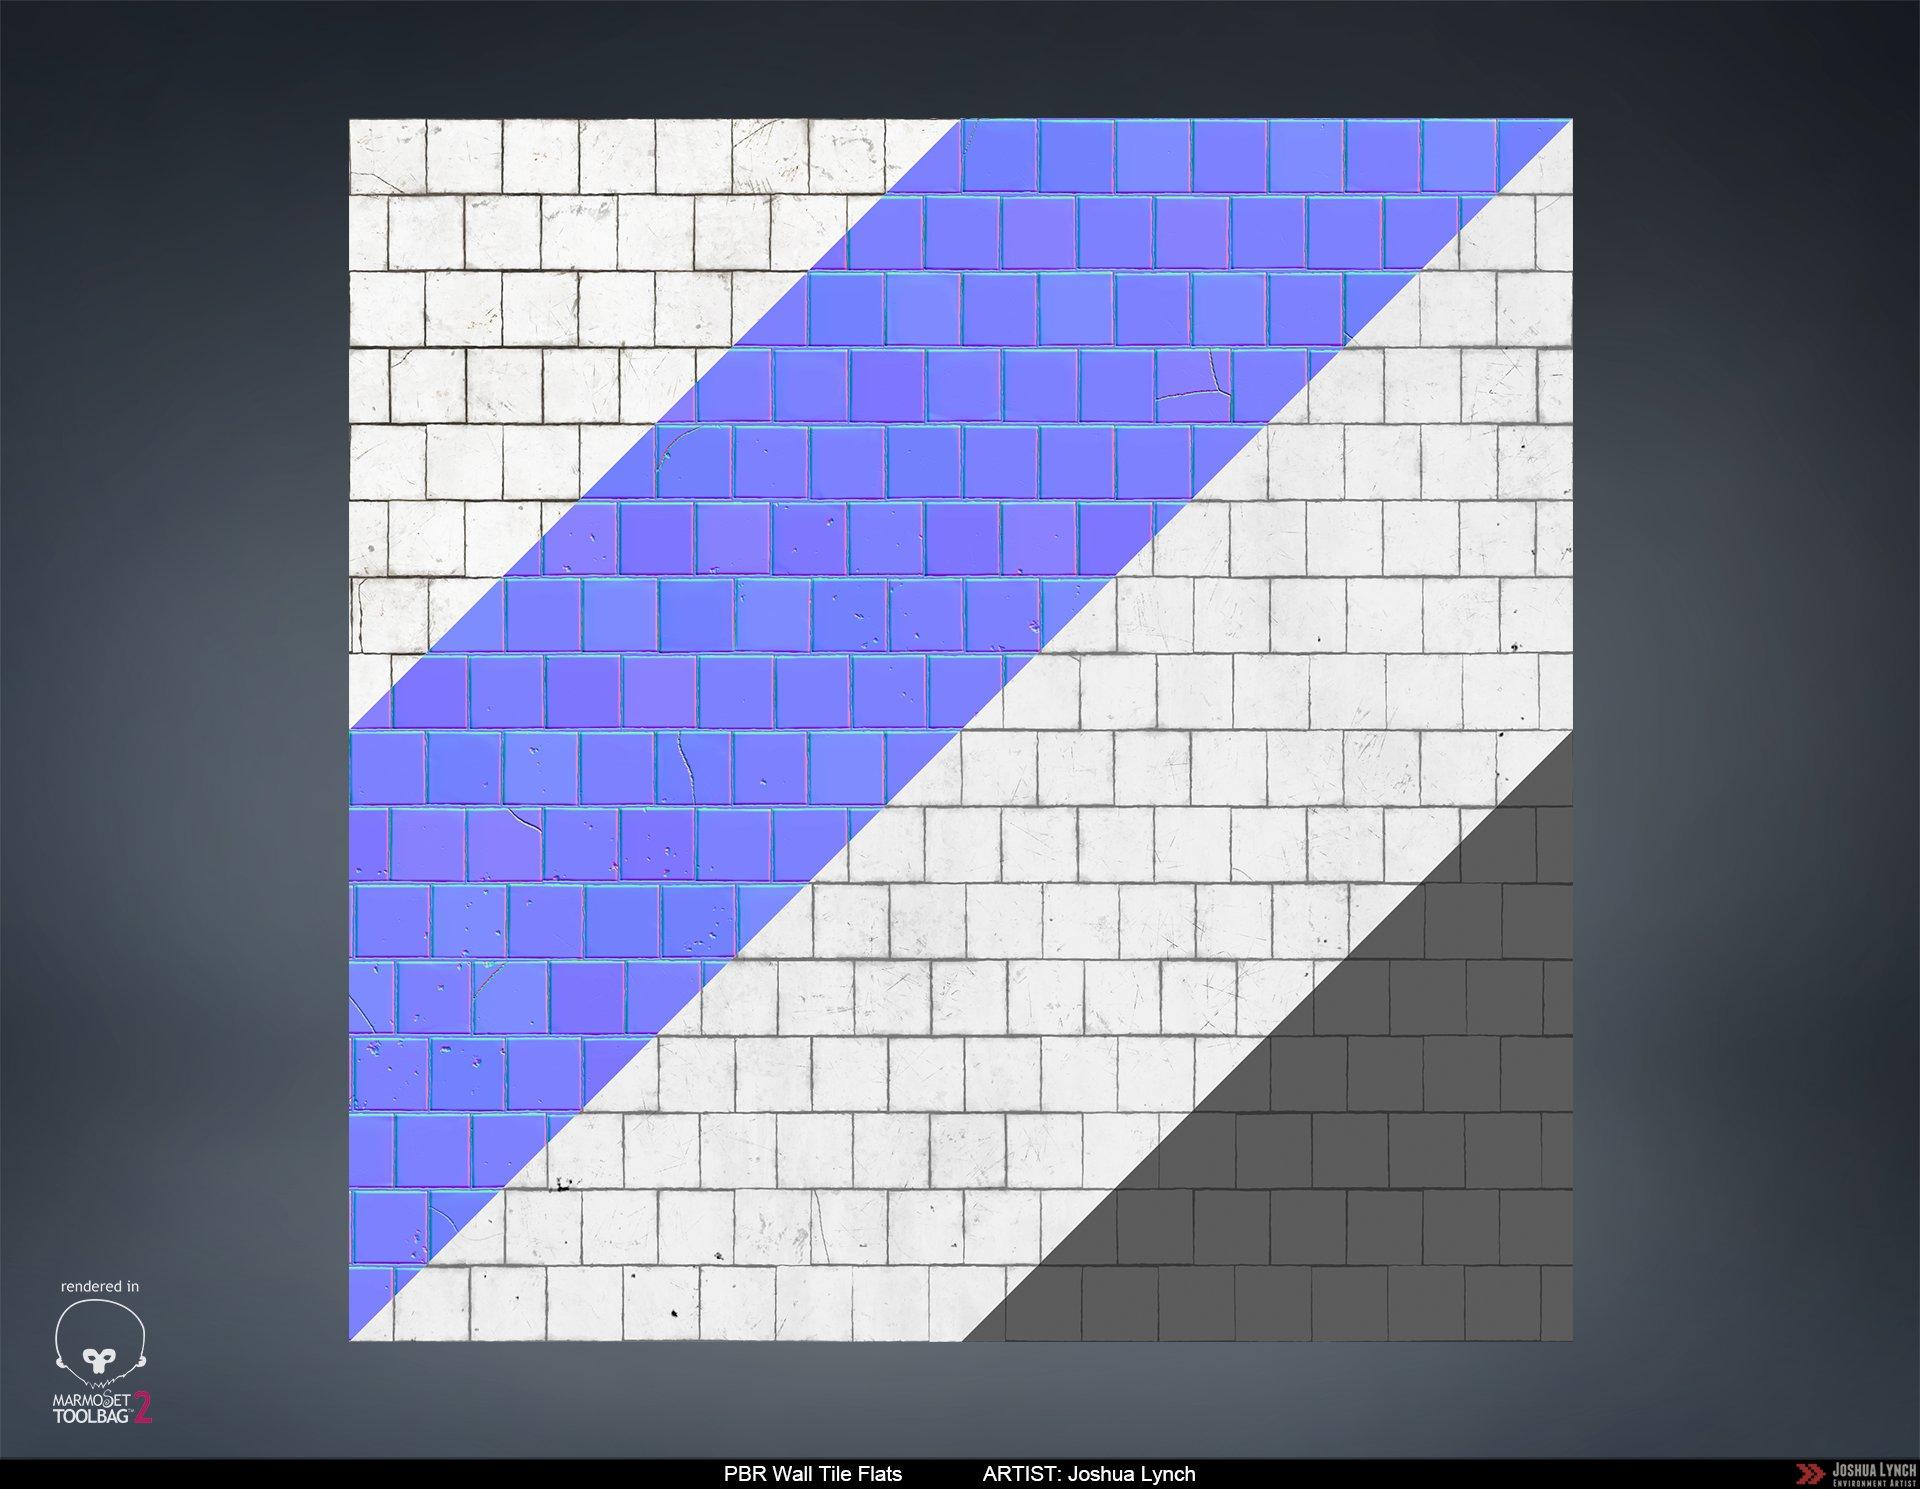 Joshua lynch subway wall tile flats layout comp josh lynch